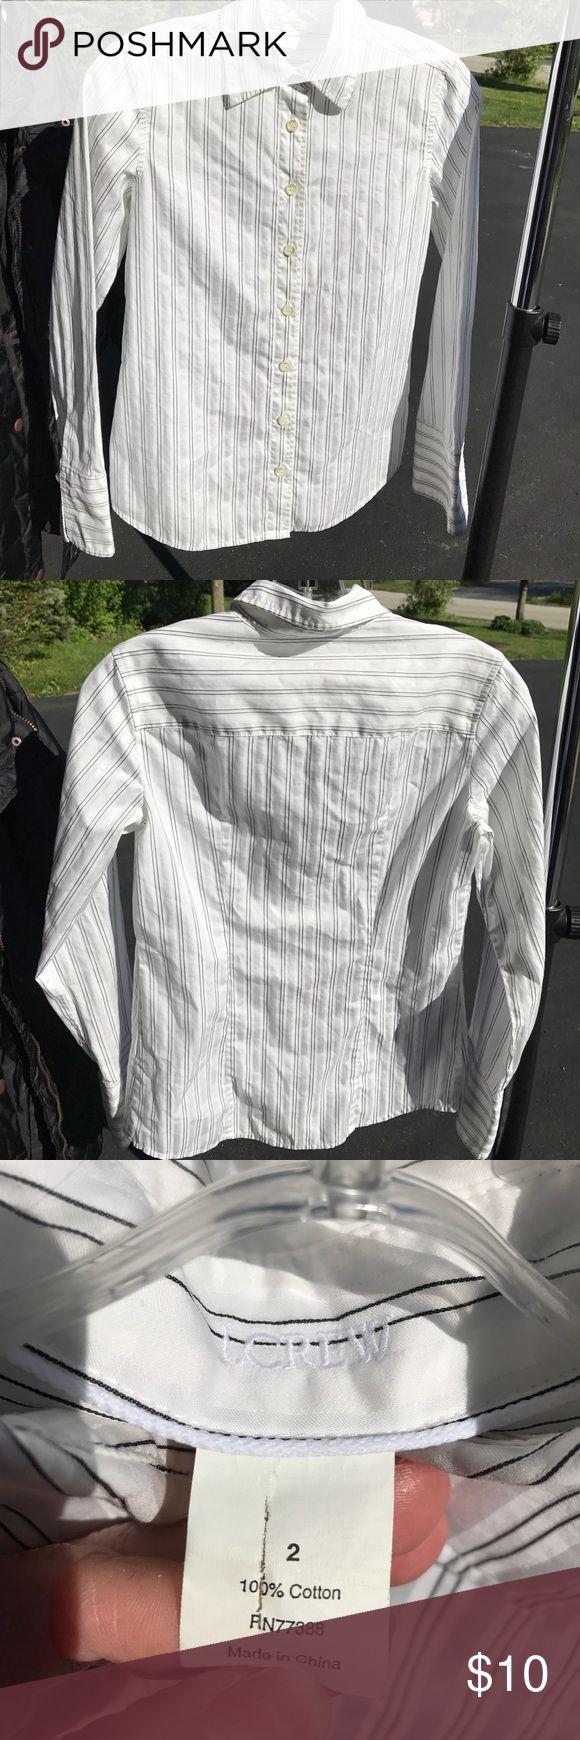 J CREW dress shirt size 2 J CREW size 2 business casual button down dress shirt. White with black pin stripe, machine washable no flaws. J. Crew Tops Button Down Shirts